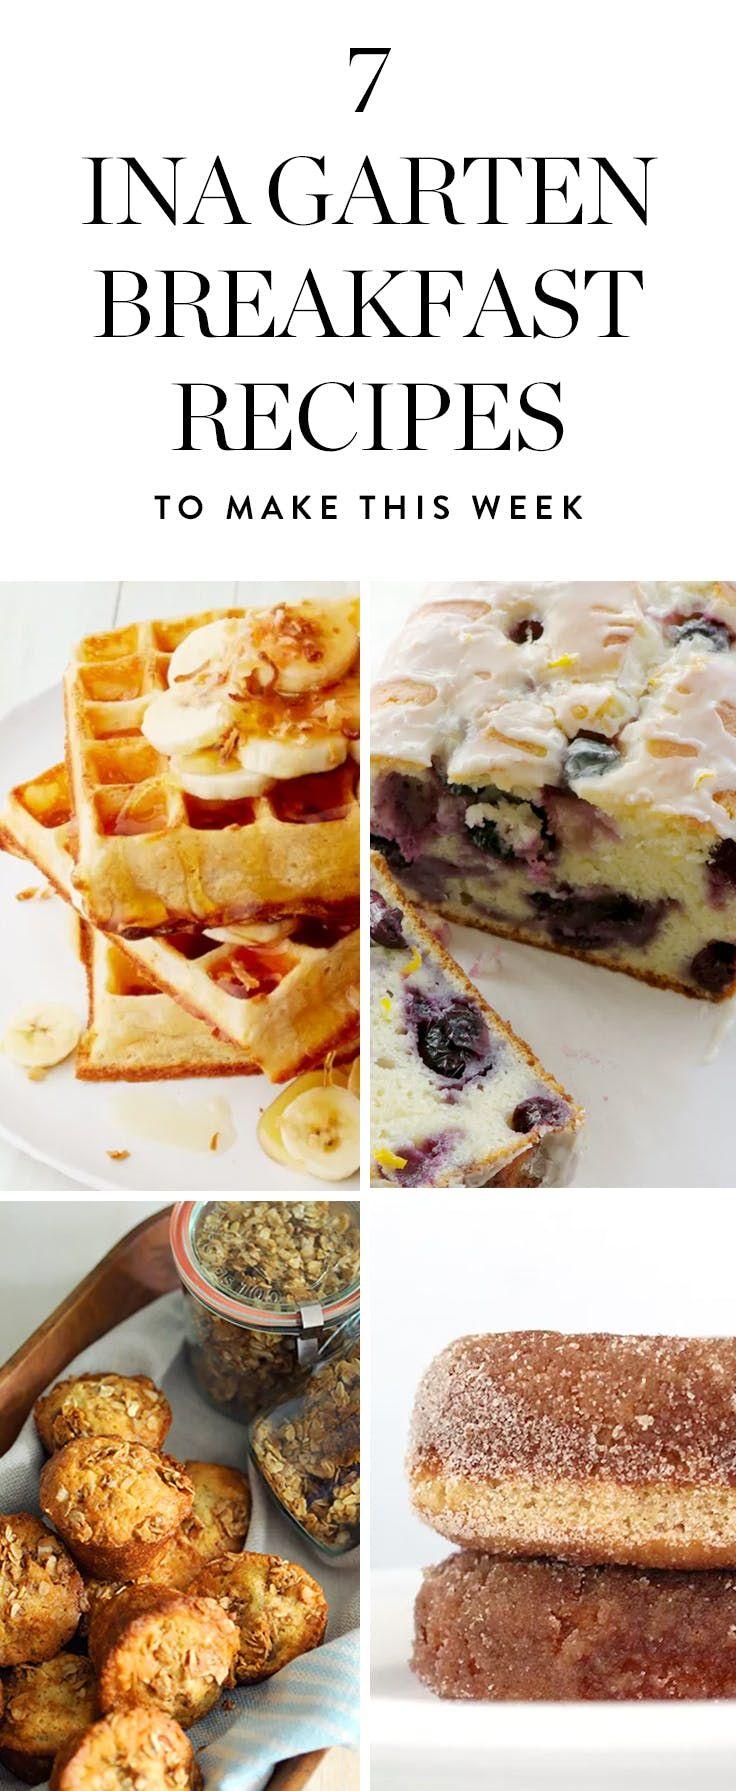 7 Ina Garten Breakfast Recipes We Re Making This Week Via Purewow